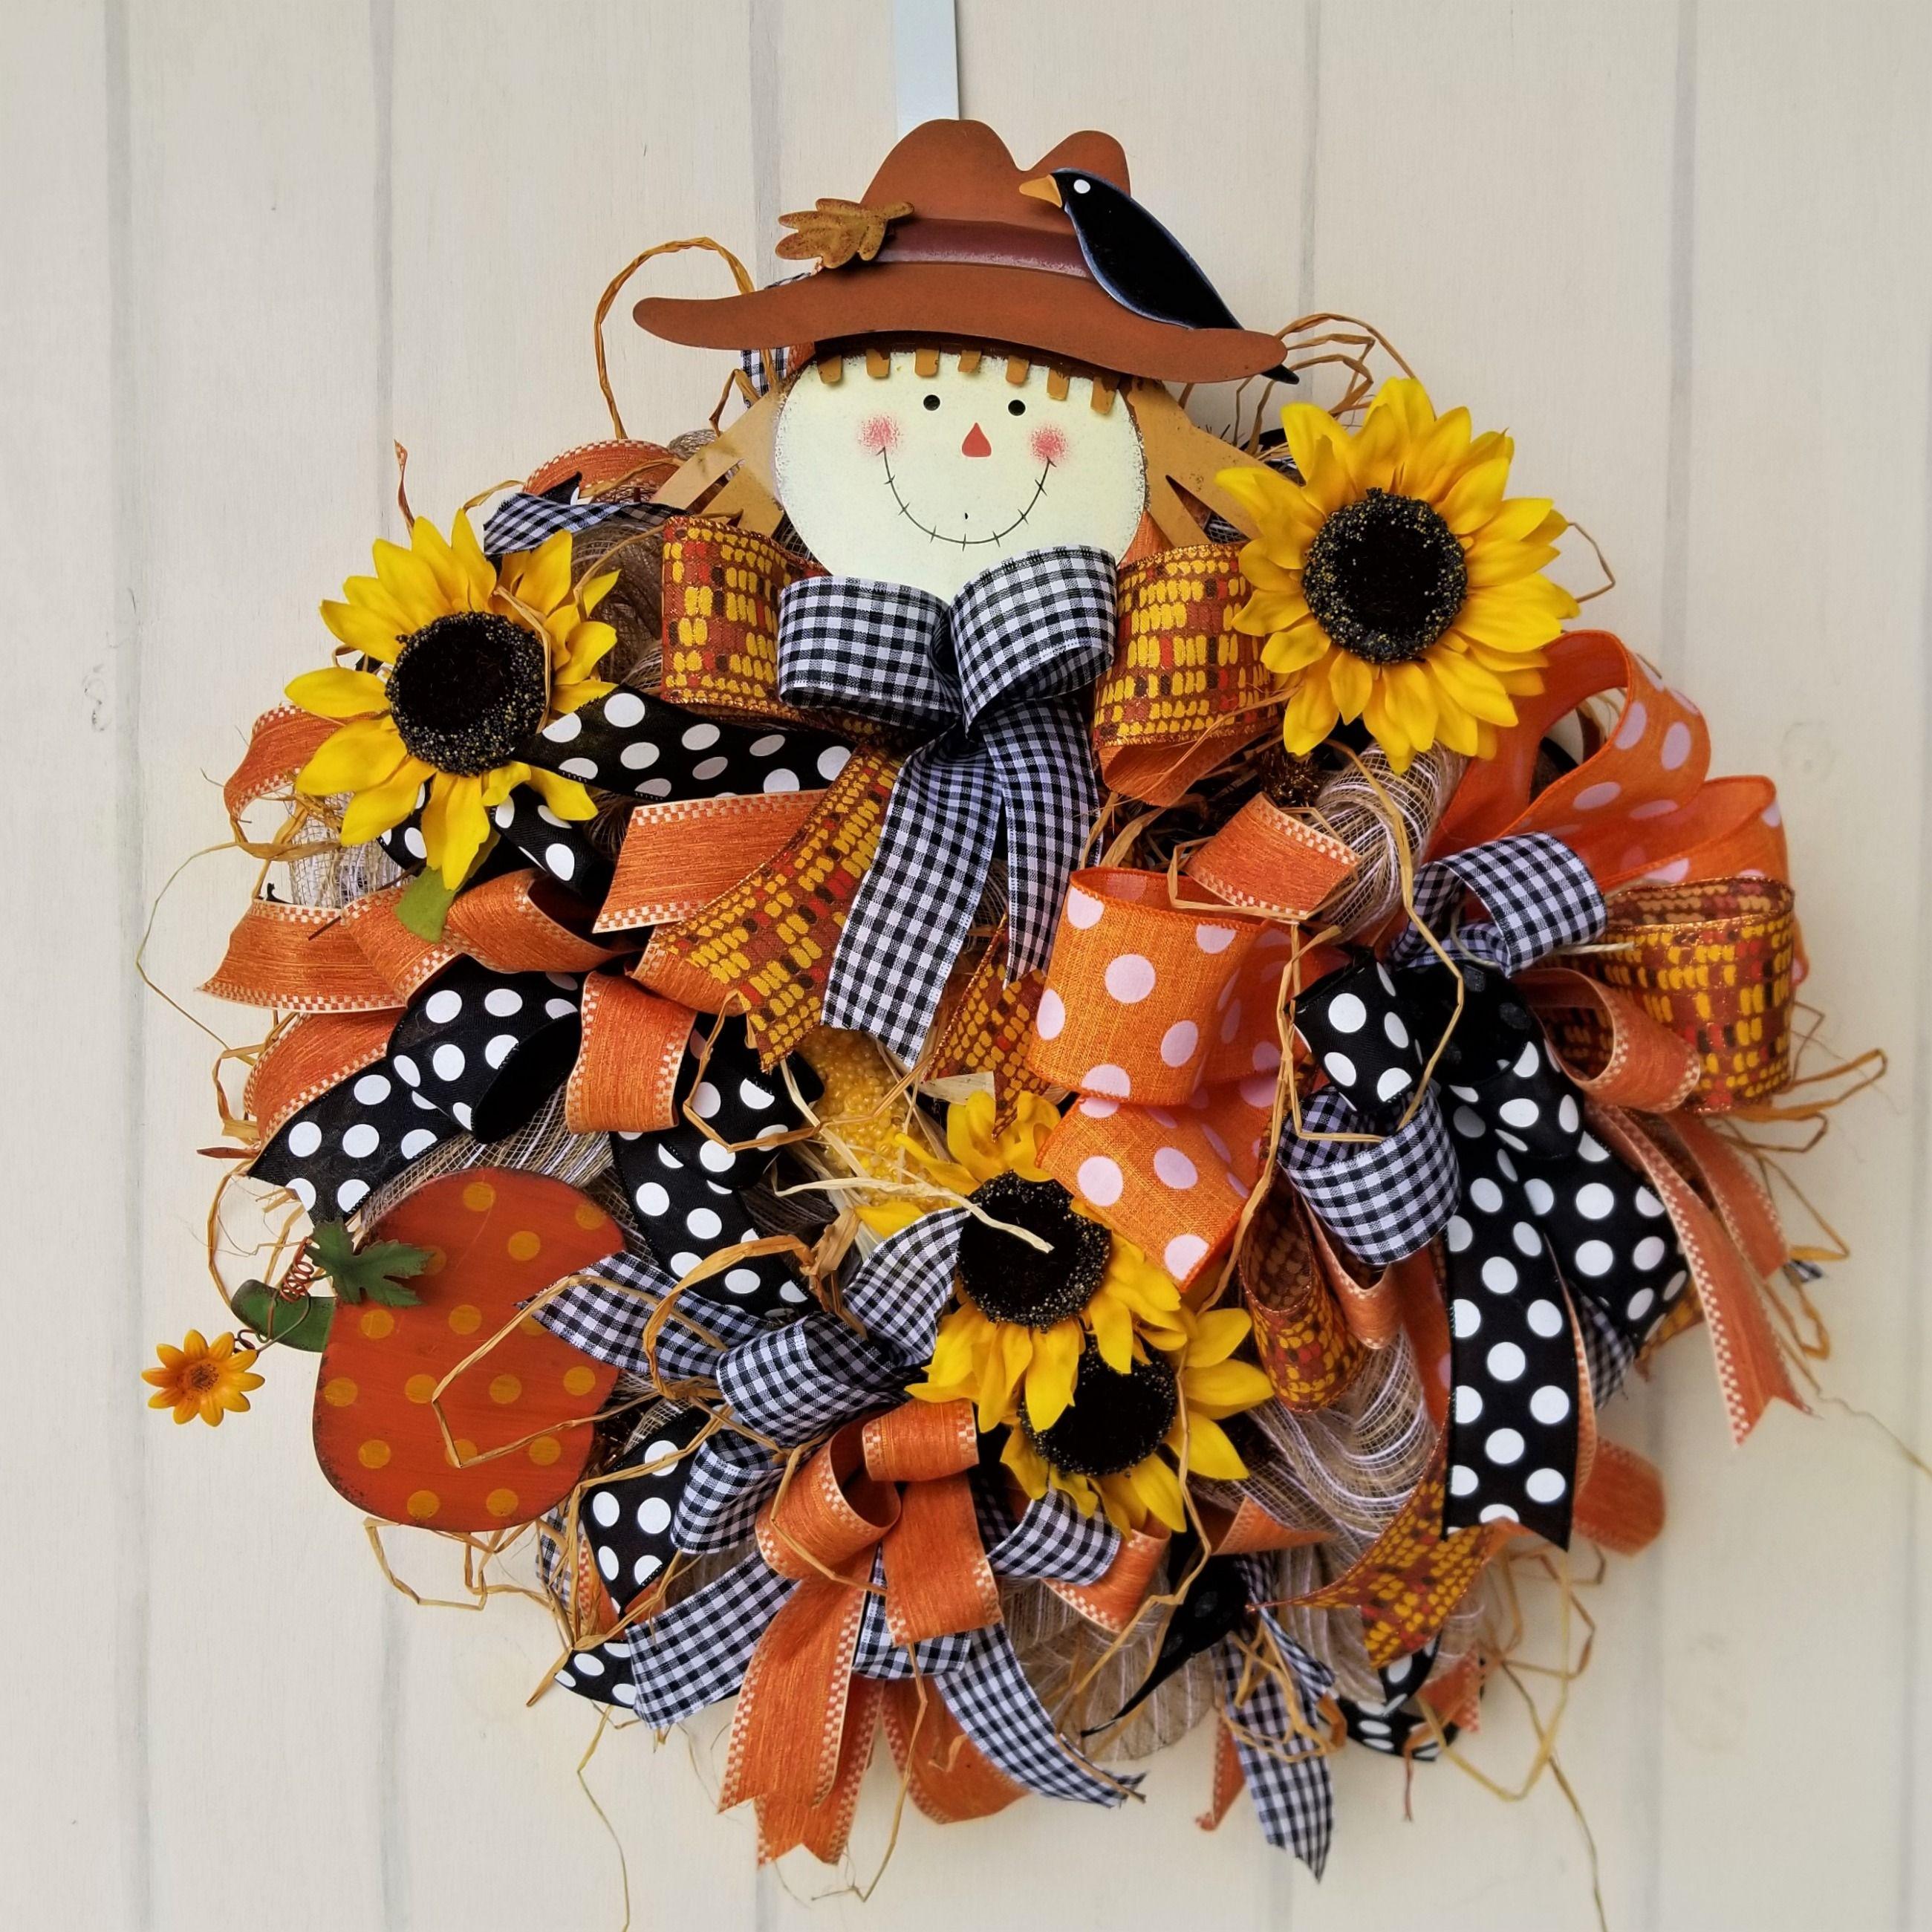 Whimsical Scarecrow Wreath #scarecrowwreath